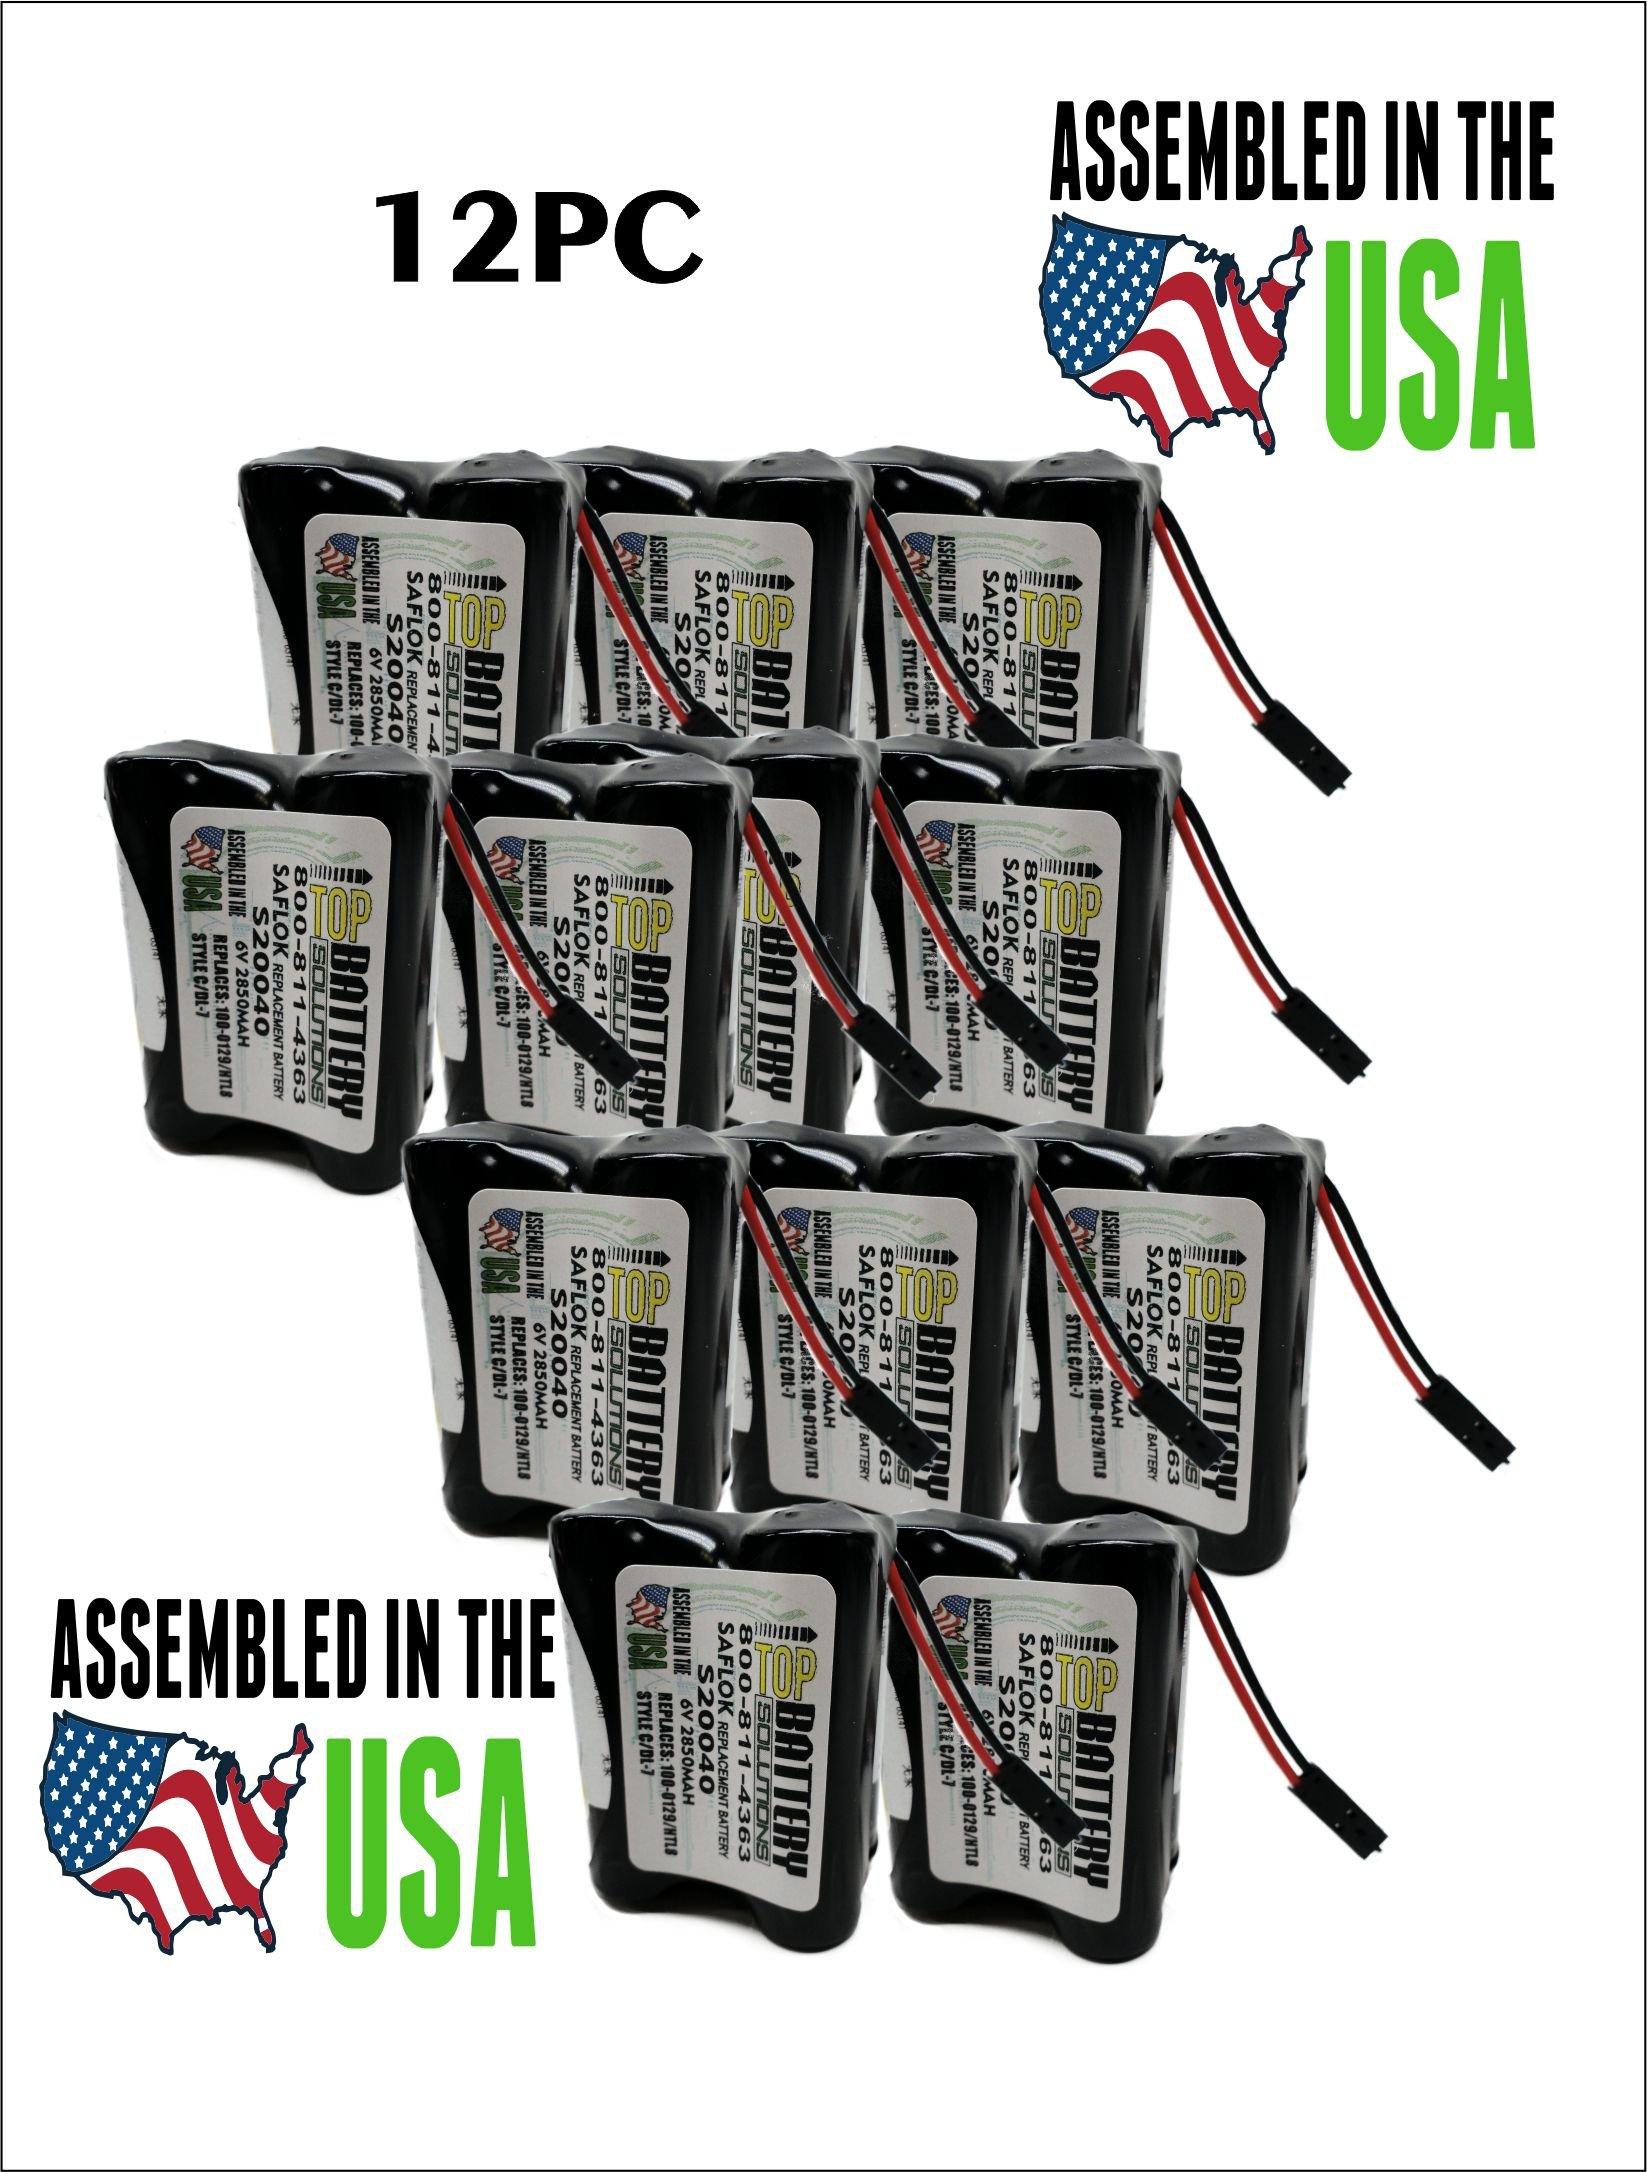 12PC Saflok S20040 Door Lock Batteries - DL-7 REPLACEMENT by TOP BATTERY SOLUTIONS